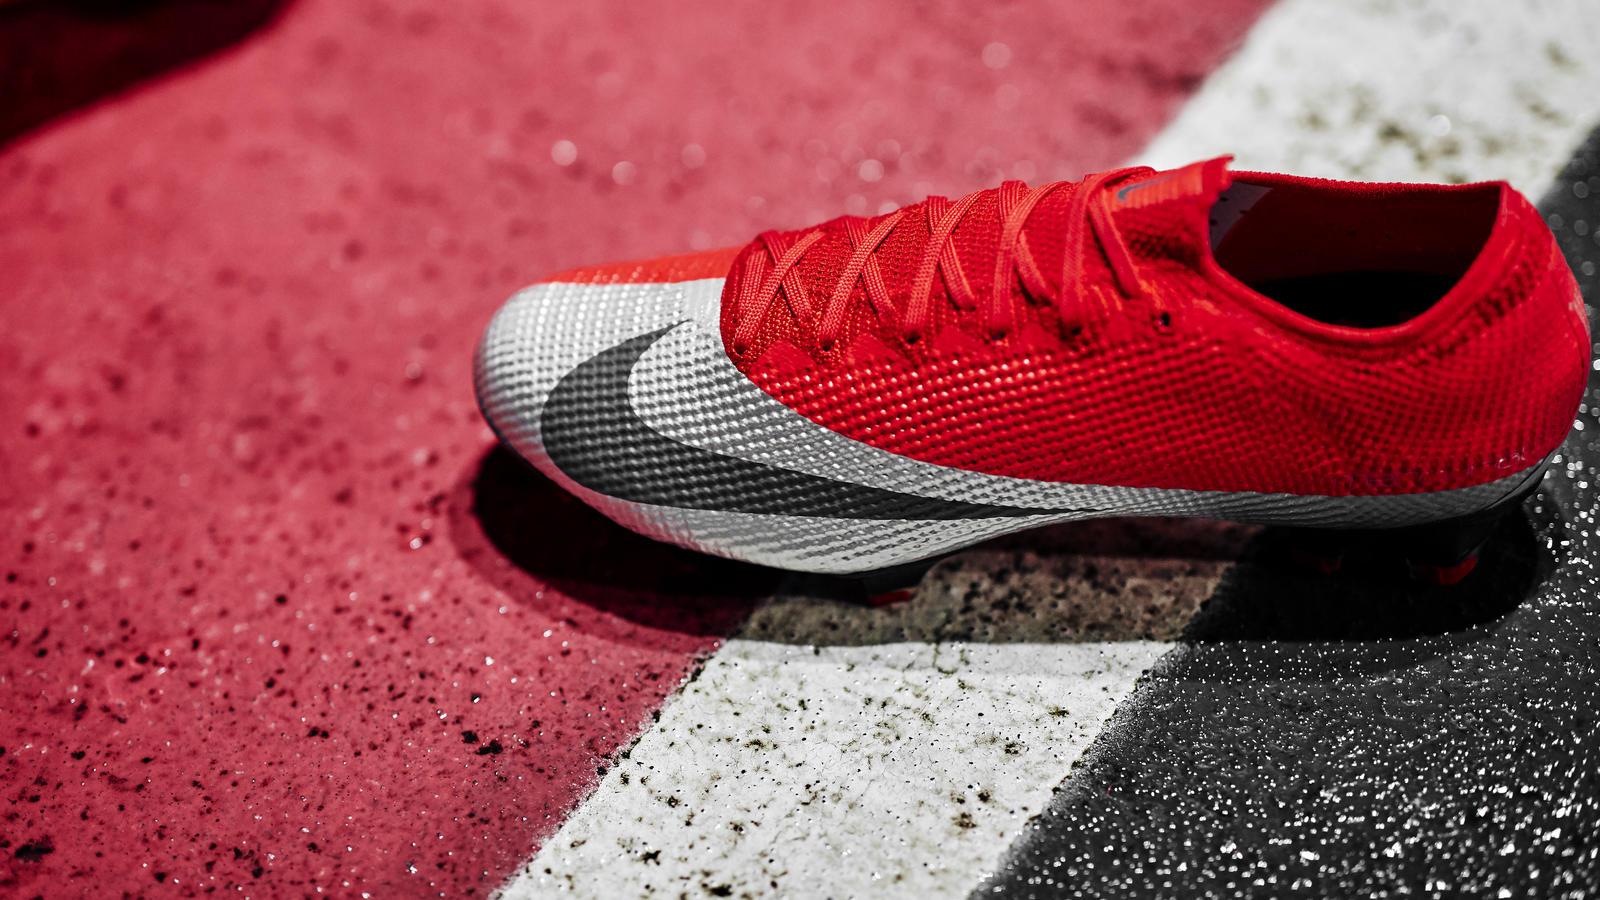 Nike Mercurial Vapor 'Future DNA Mercurial' 1